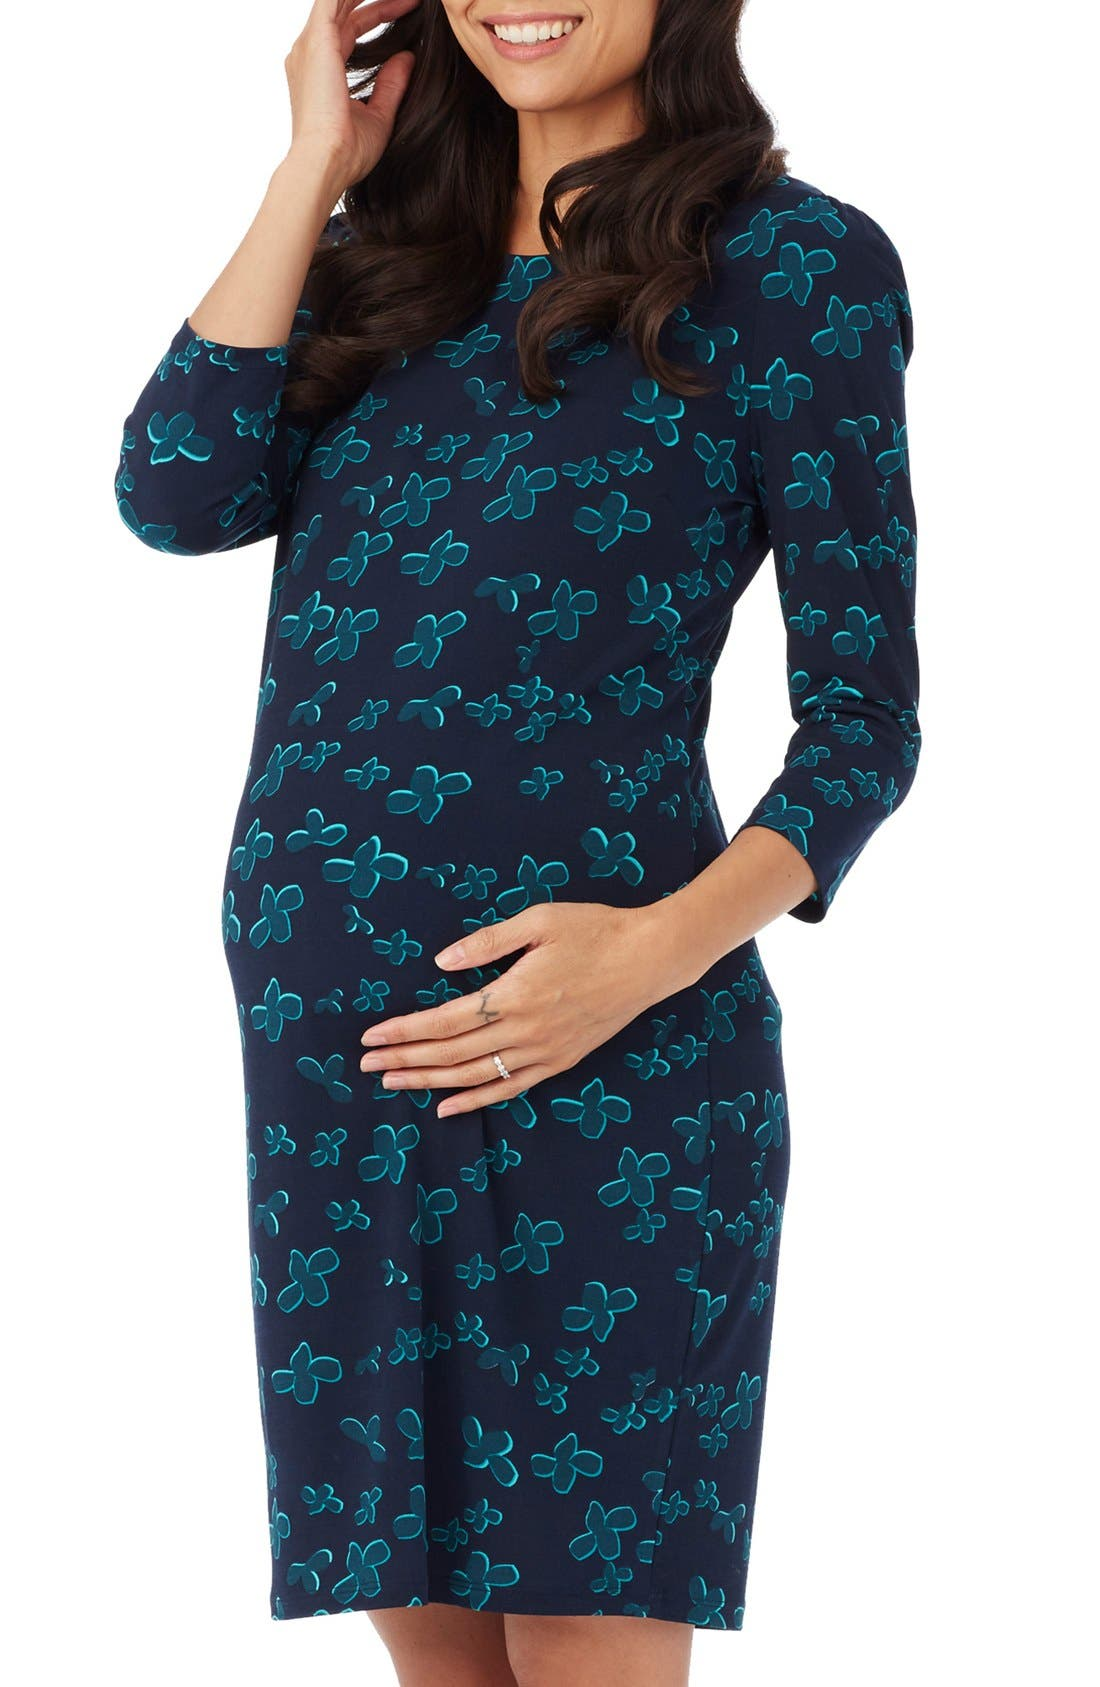 Rosie Pope 'Audra' Maternity Dress